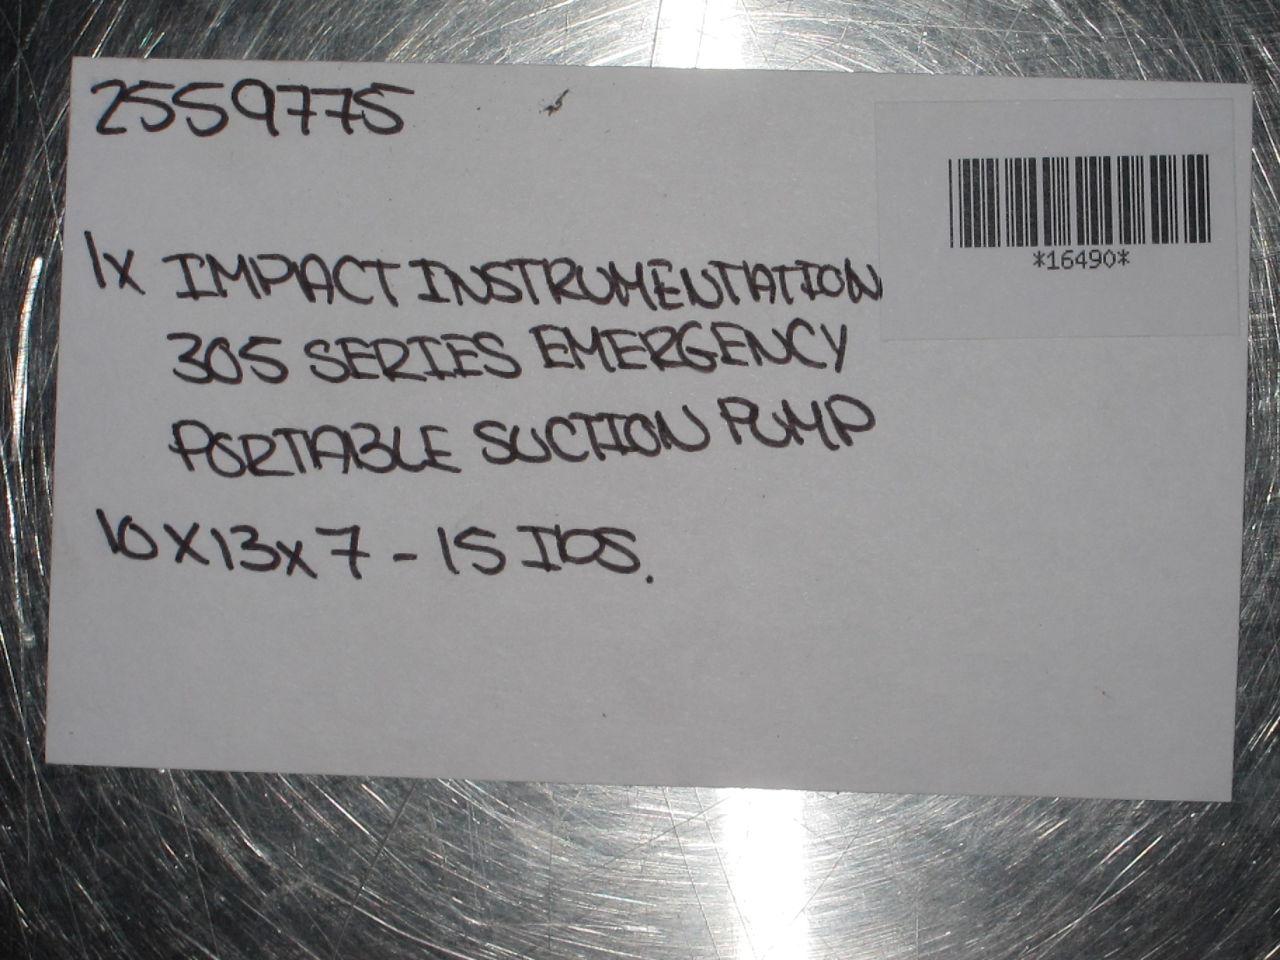 IMPACT INSTRUMENTATION 305 Series Aspirator